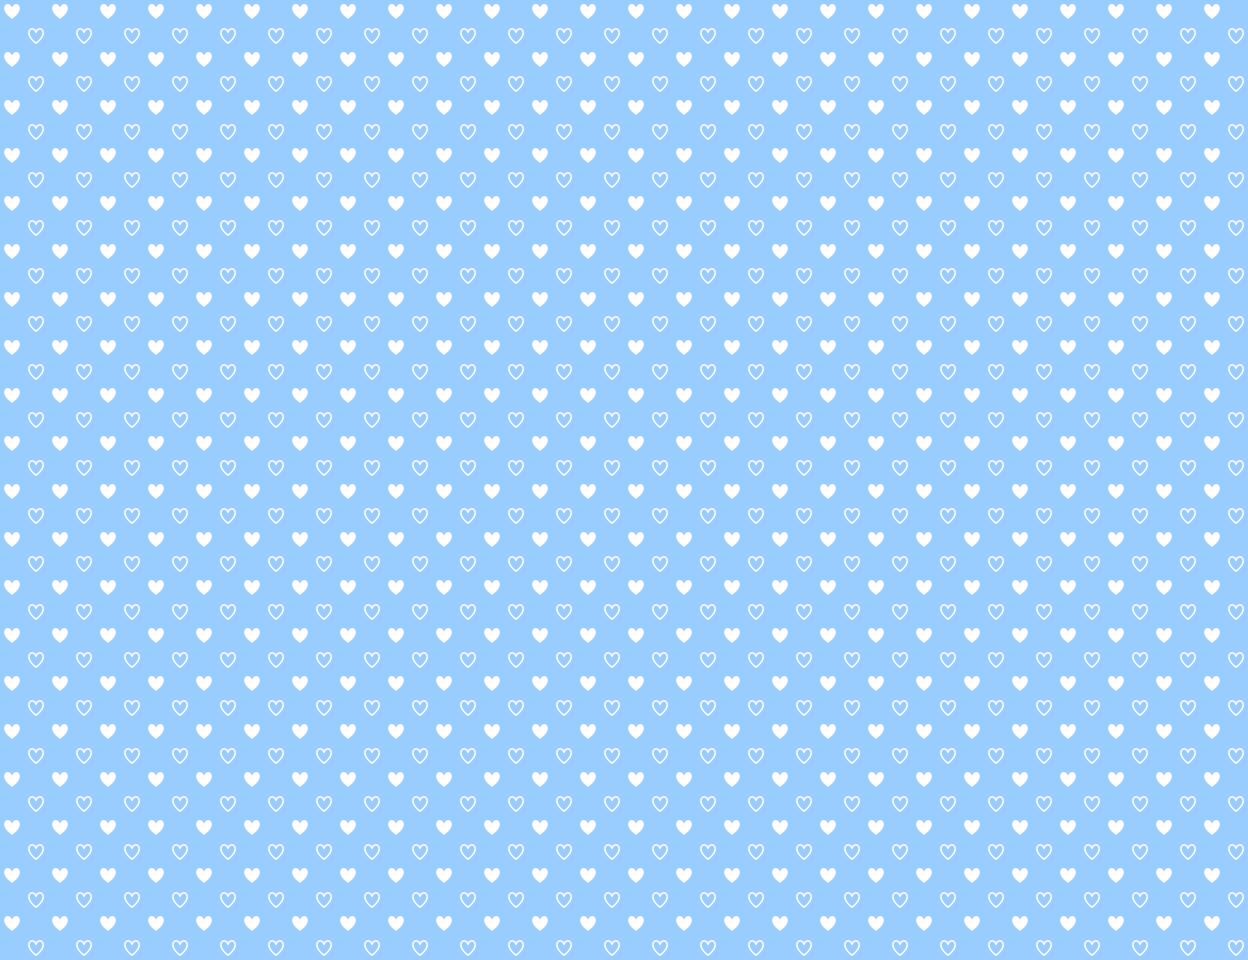 light blue heart background - photo #33